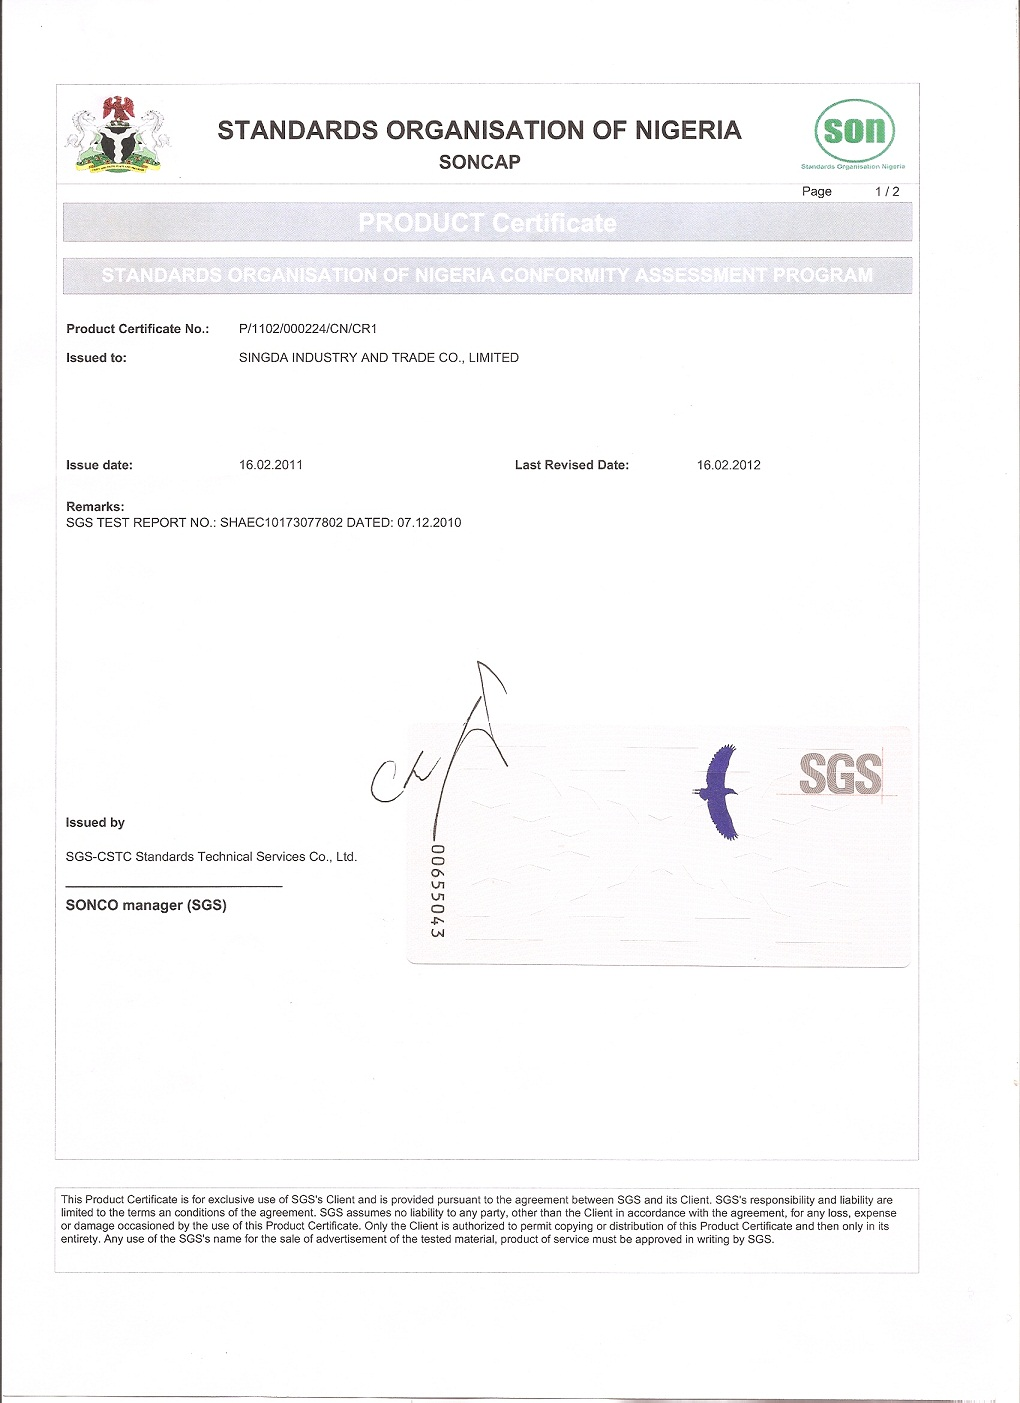 Product certificate of satellite dish (antenna)